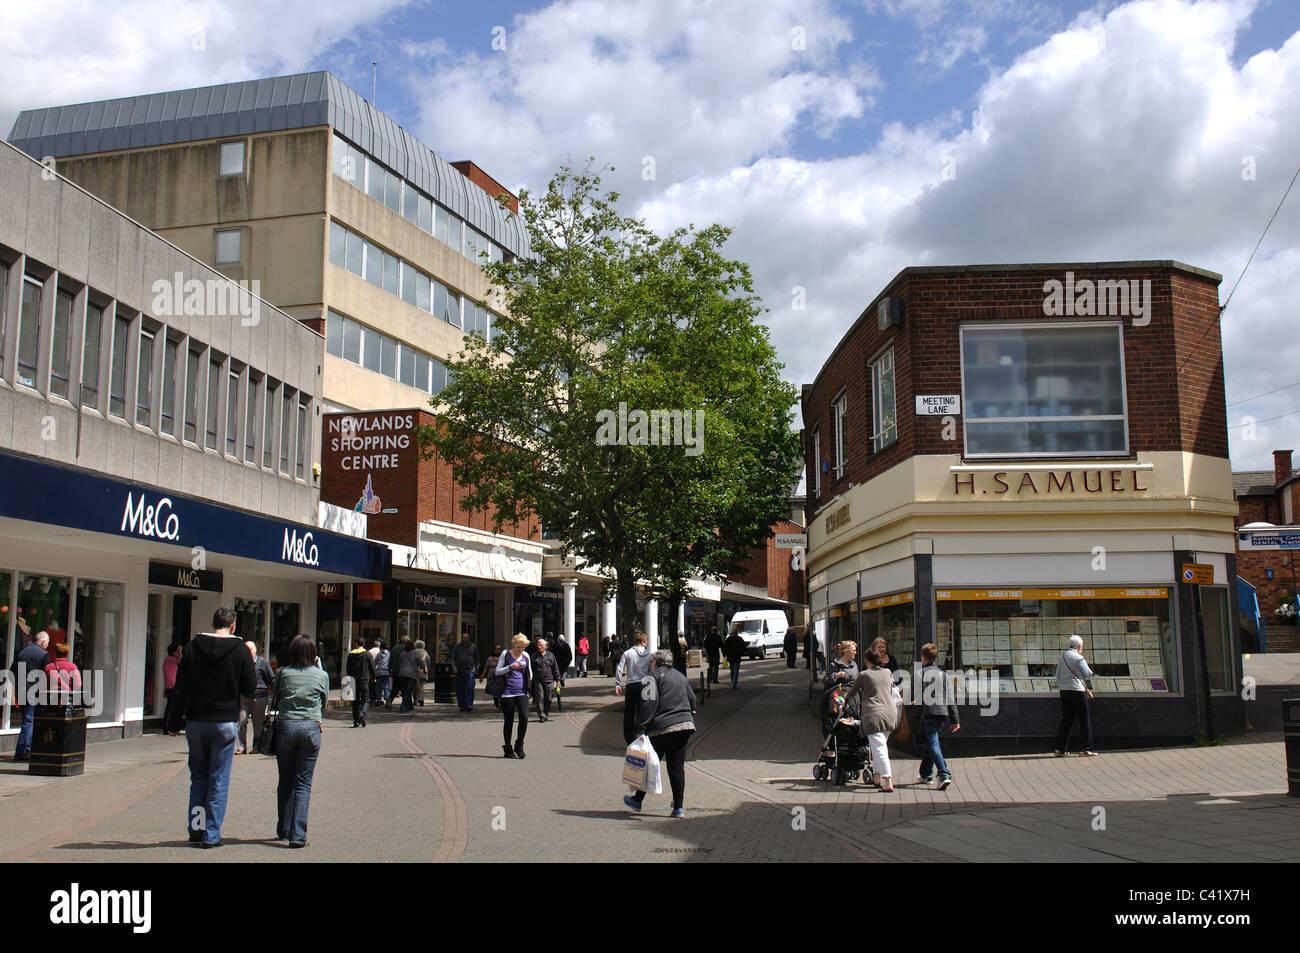 Gold Street, Kettering, Northamptonshire, England, UK - Stock Image